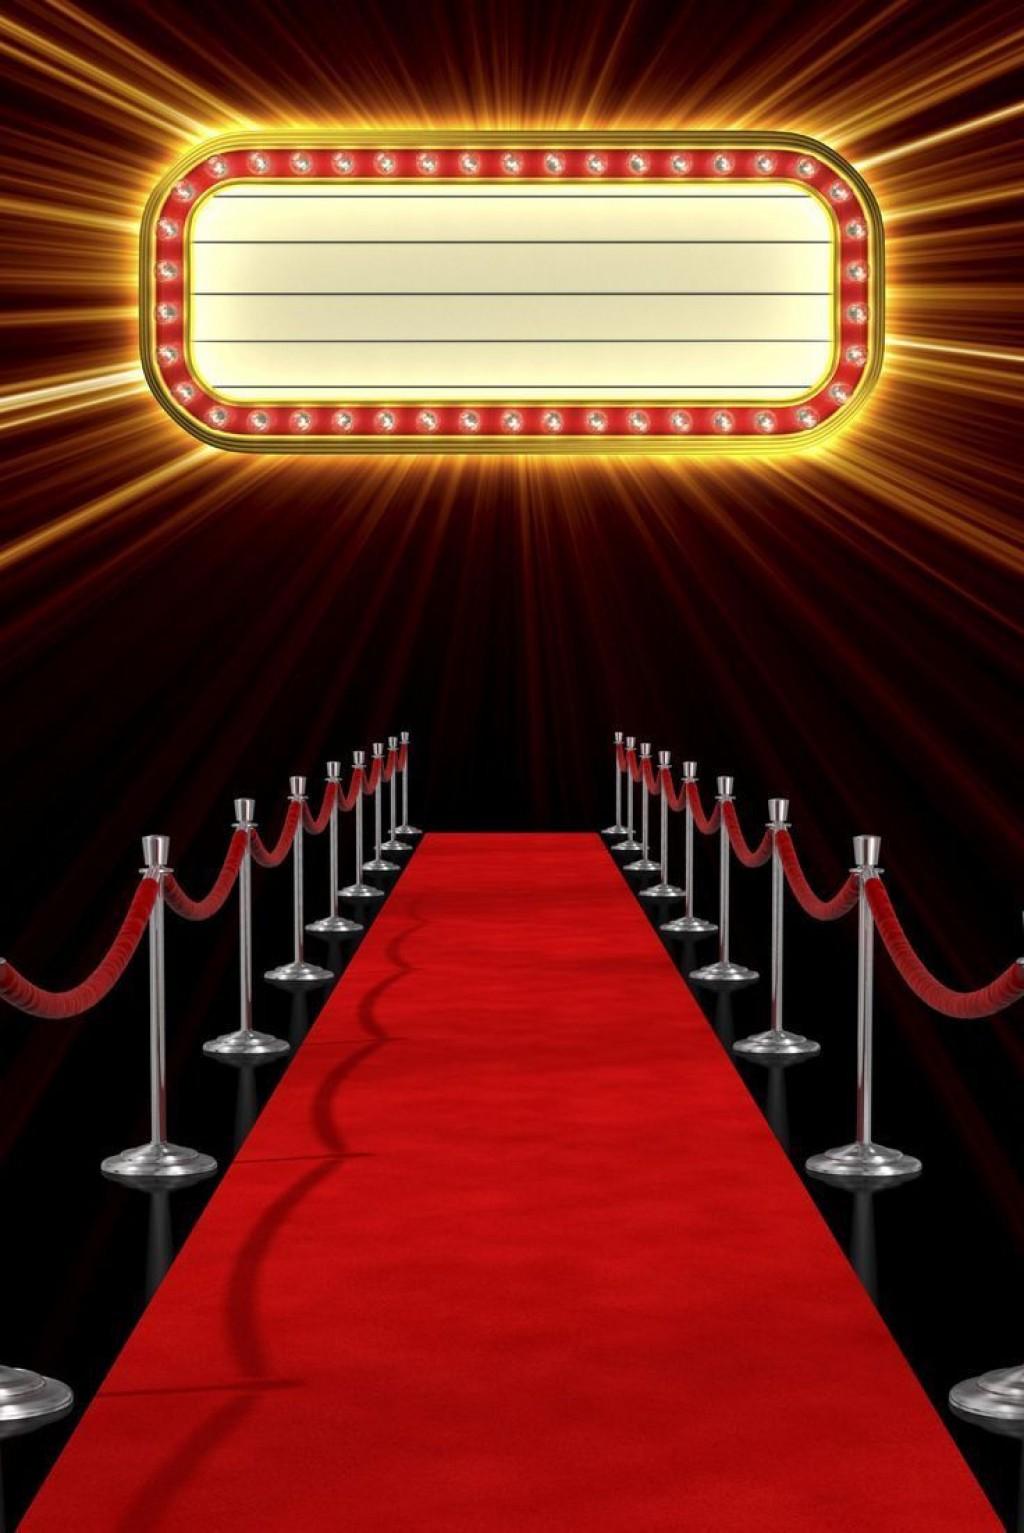 000 Unusual Red Carpet Invitation Template Free Idea  DownloadLarge